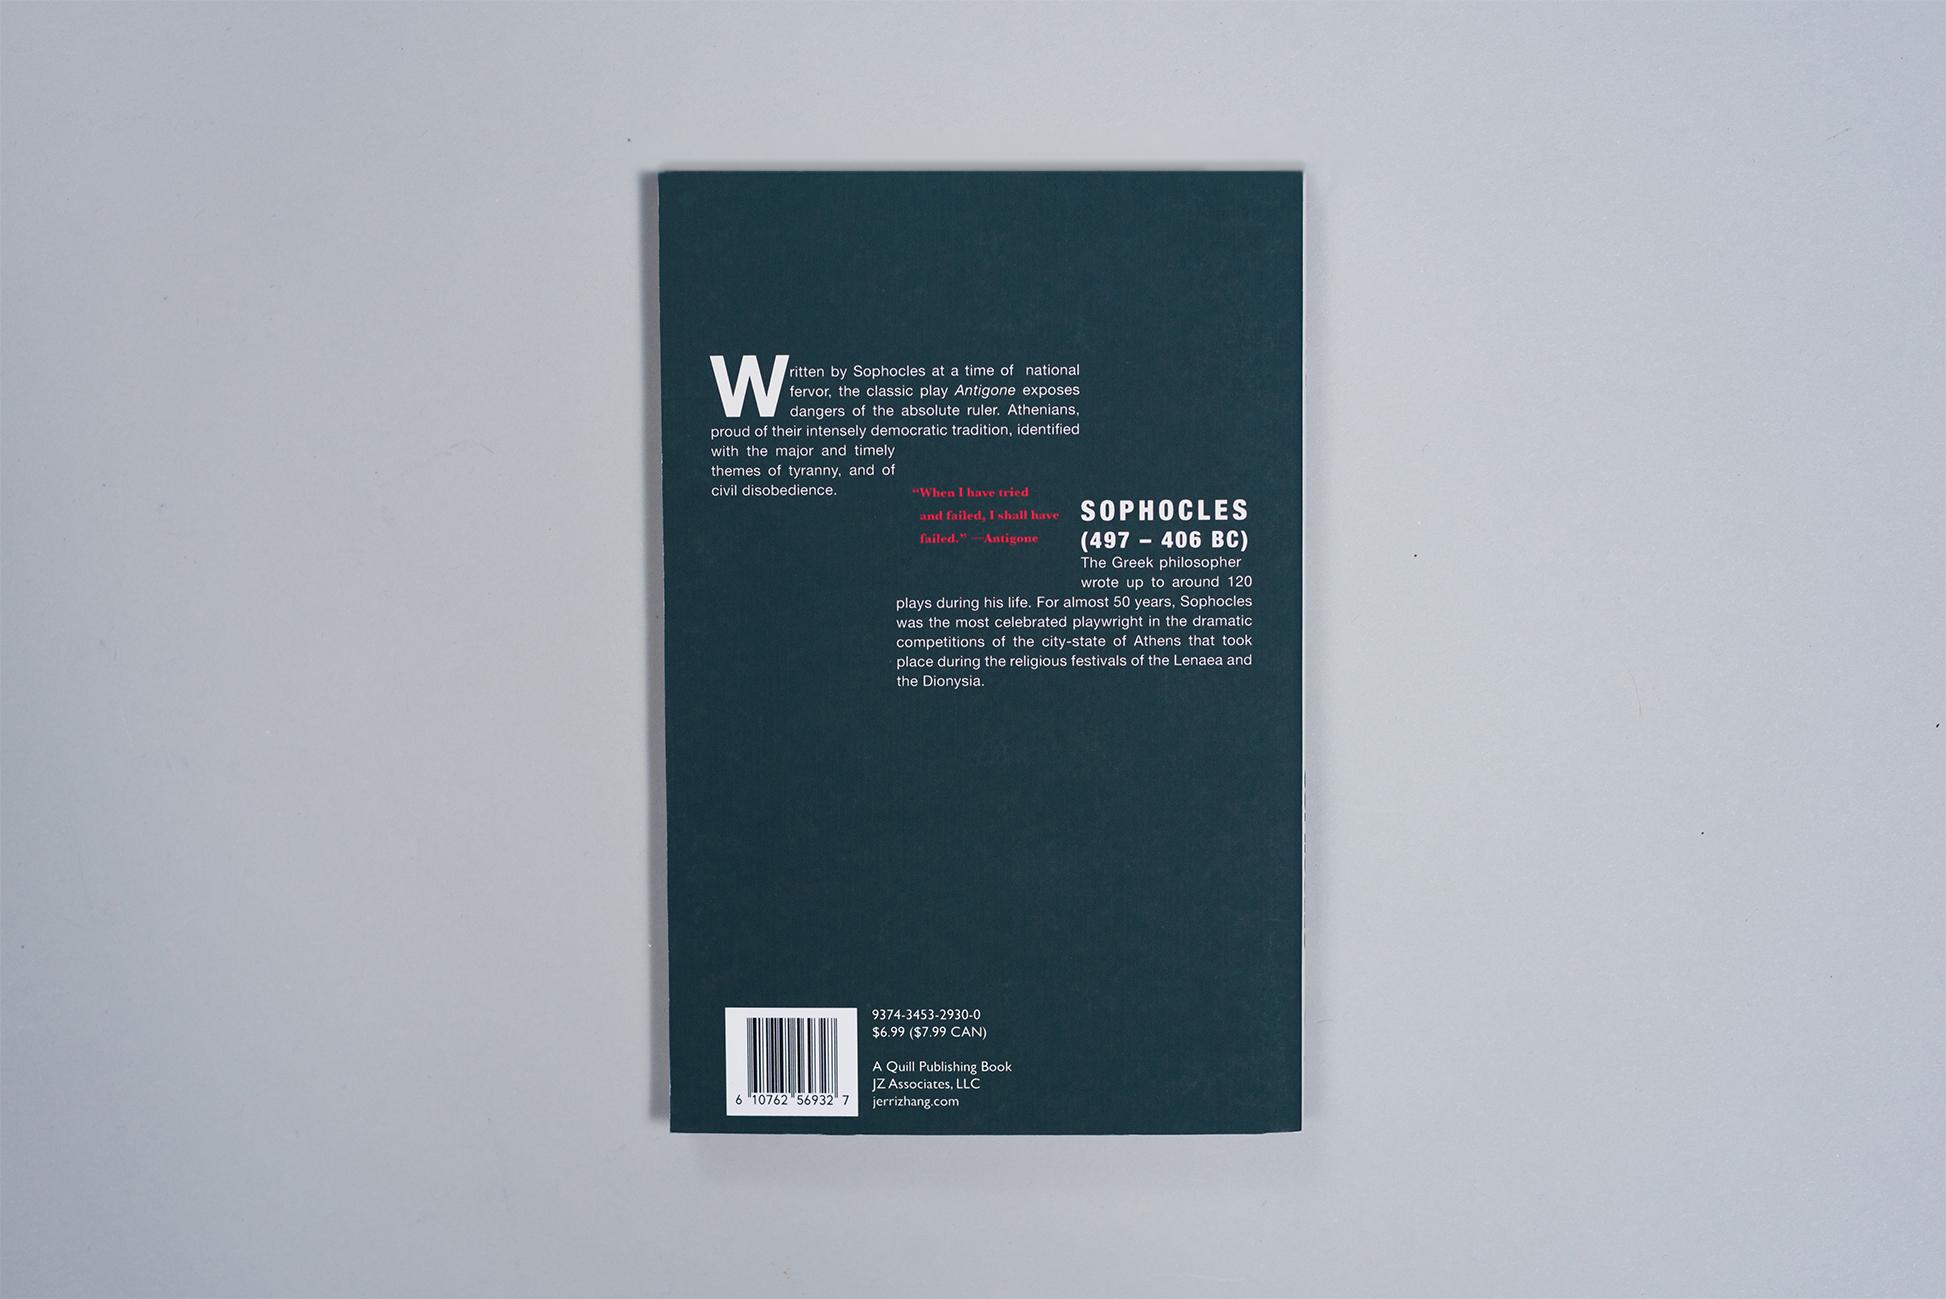 book_photos-48 copy copy.jpg